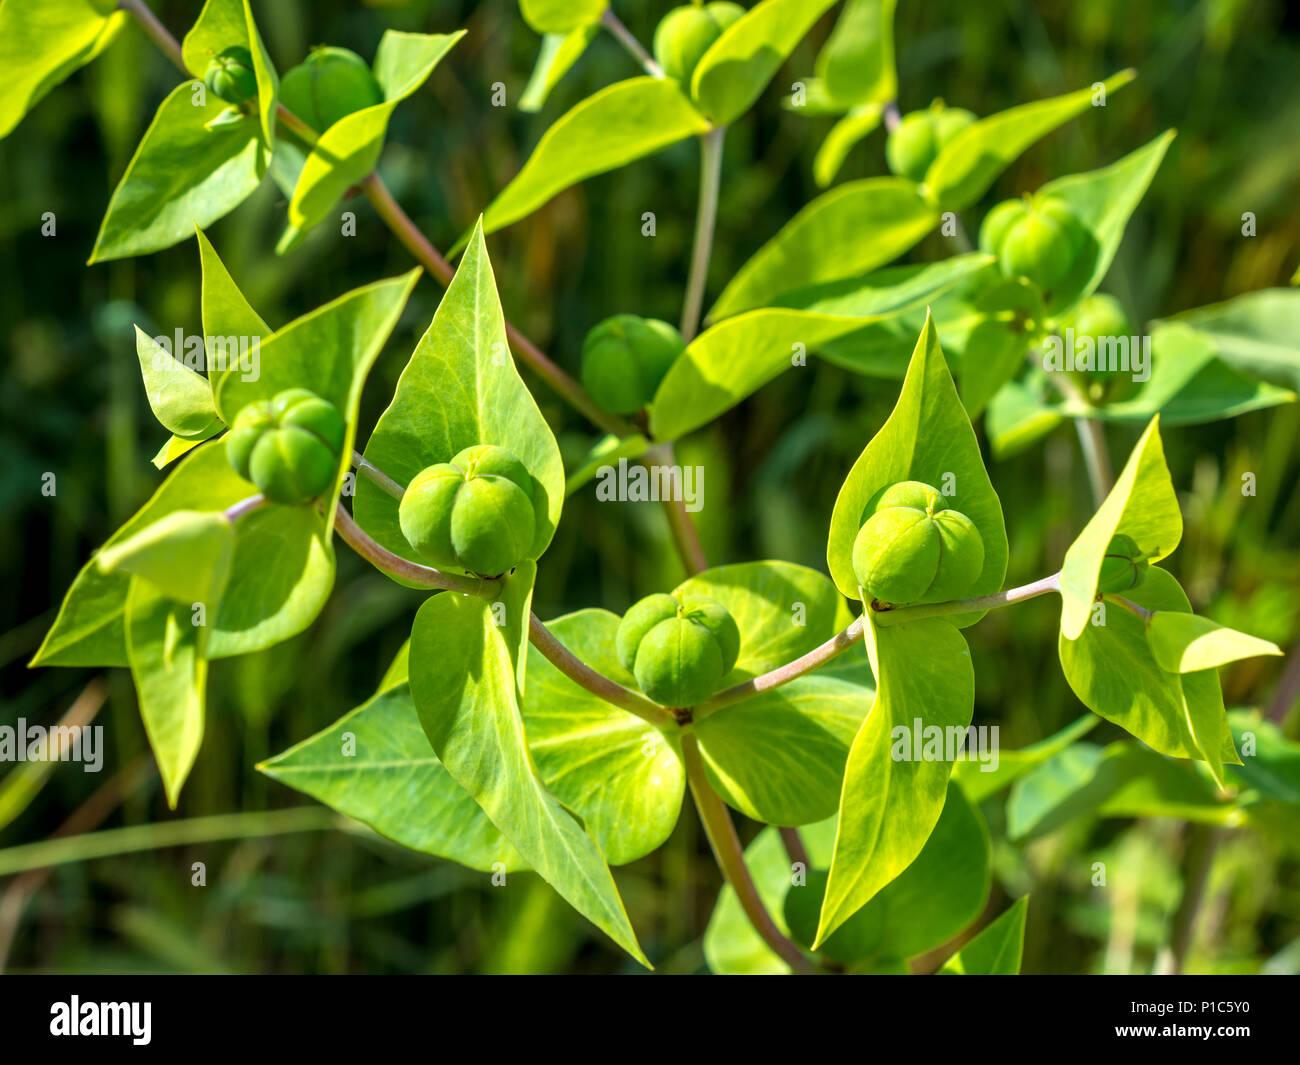 Caper Spurge / Euphorbia lathyris biennial plant, France. - Stock Image